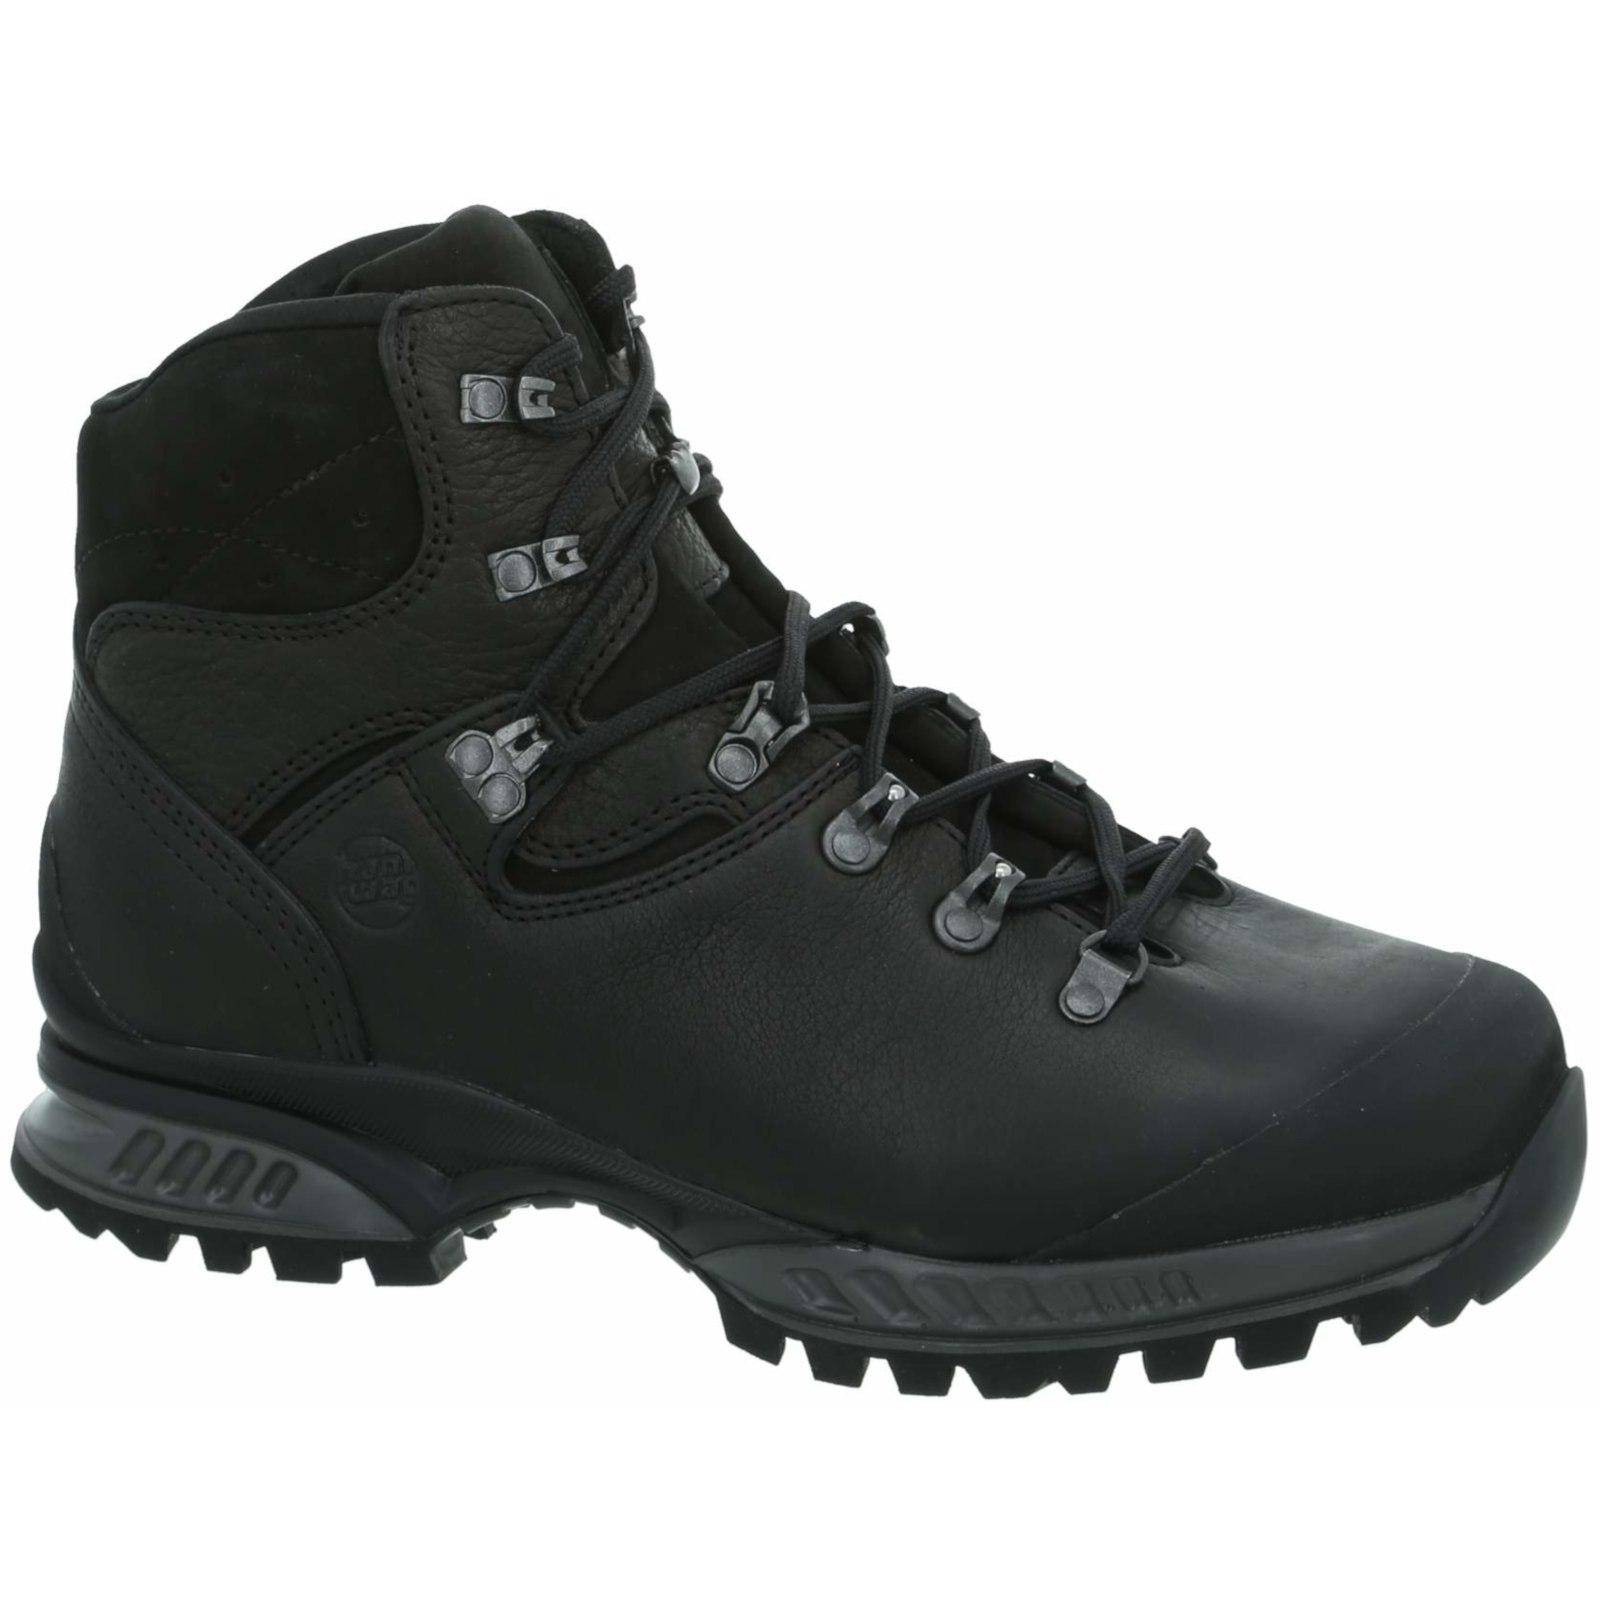 Hanwag Lhasa II Shoe - Black/Asphalt